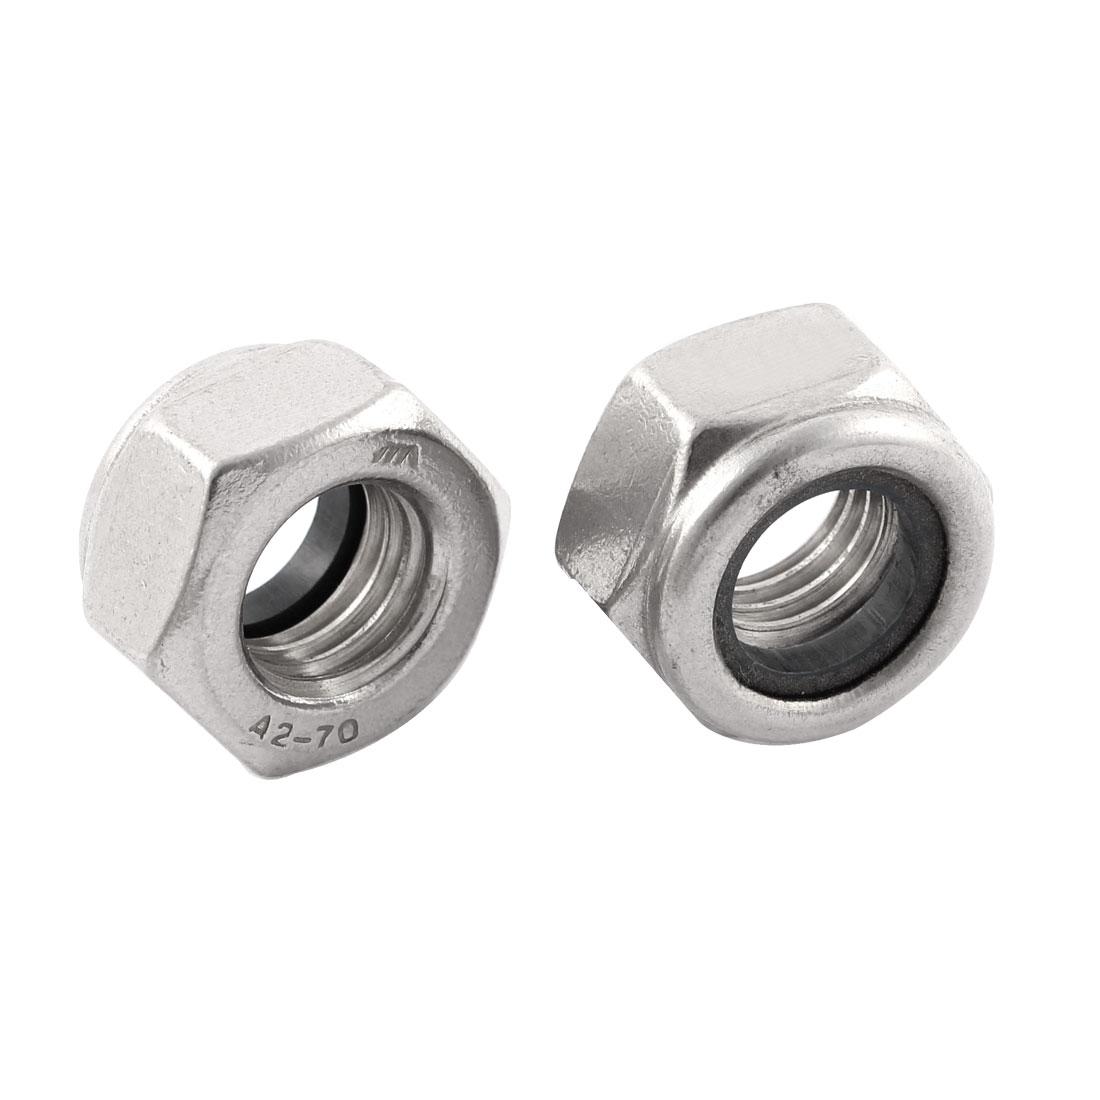 2 Pcs M14x2mm Stainless Steel Nylon Insert Lock Anti-loose Hex Nuts